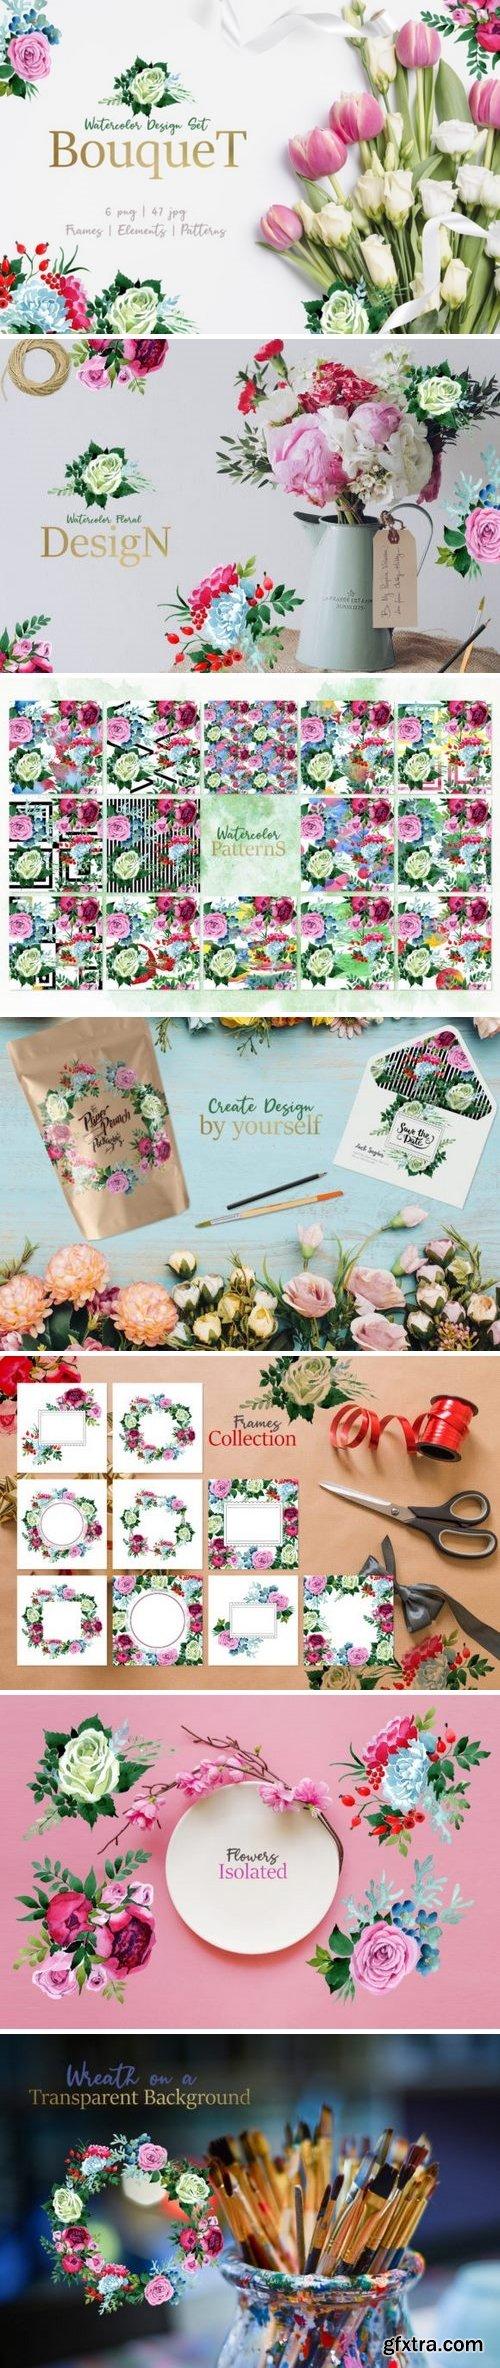 CM - Bouquet pink Tenderness Watercolor 3360516